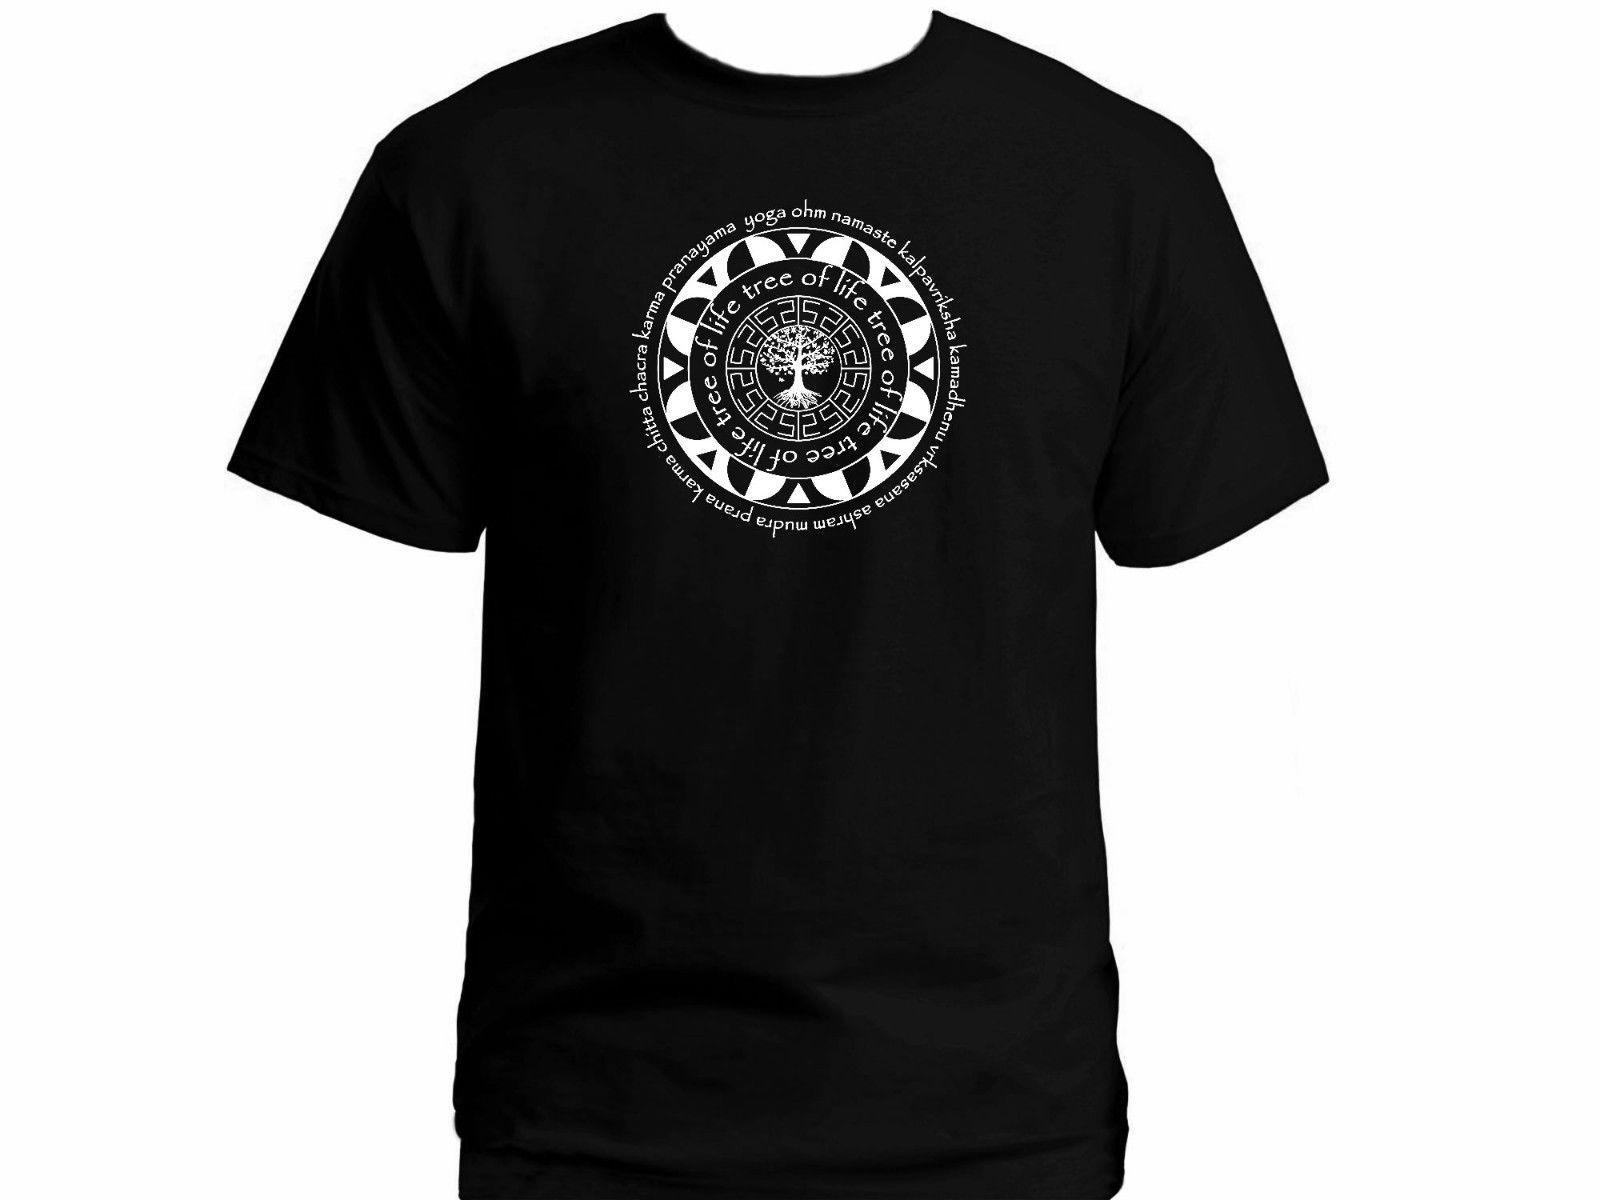 Compre Términos De Yoga Del Sagrado Arte Mandala Árbol De La Vida Namaste  Tantra Chakra Camiseta US XXL A  11.58 Del Customizedshirts46  de1037299908f